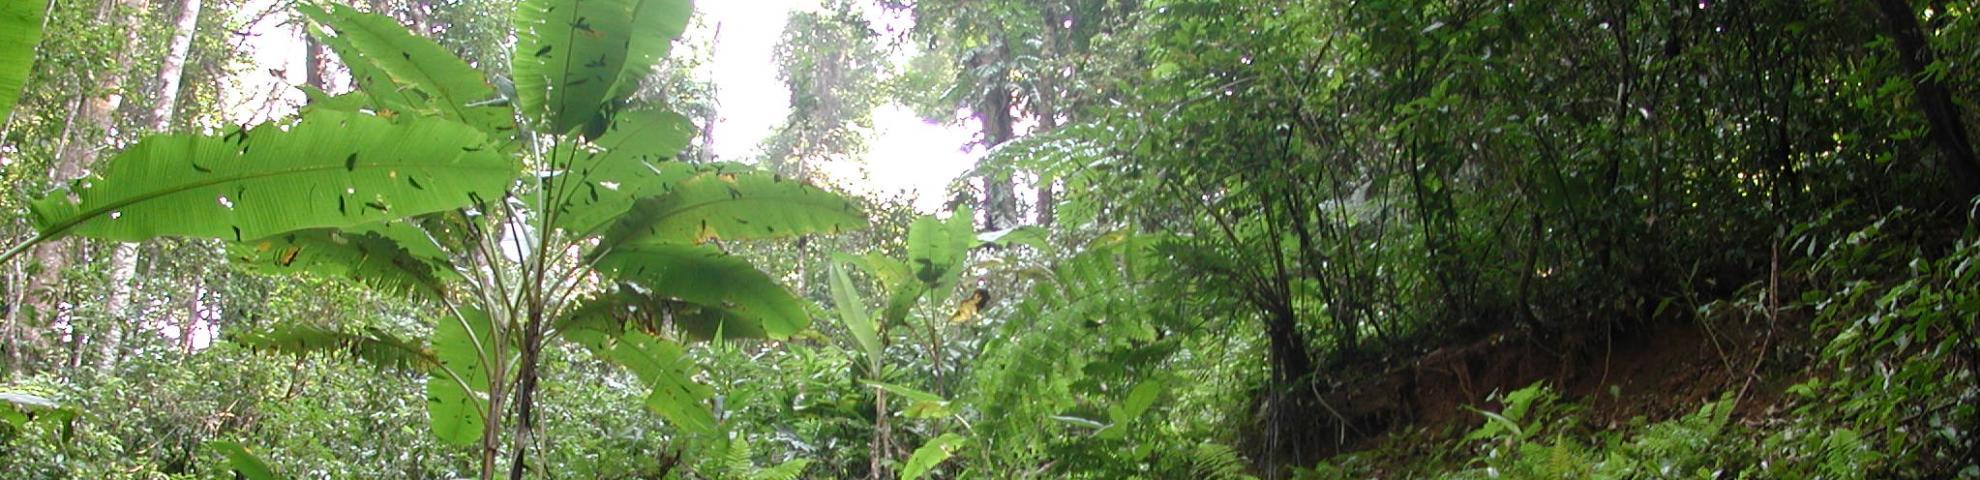 Xishuangbanna forest